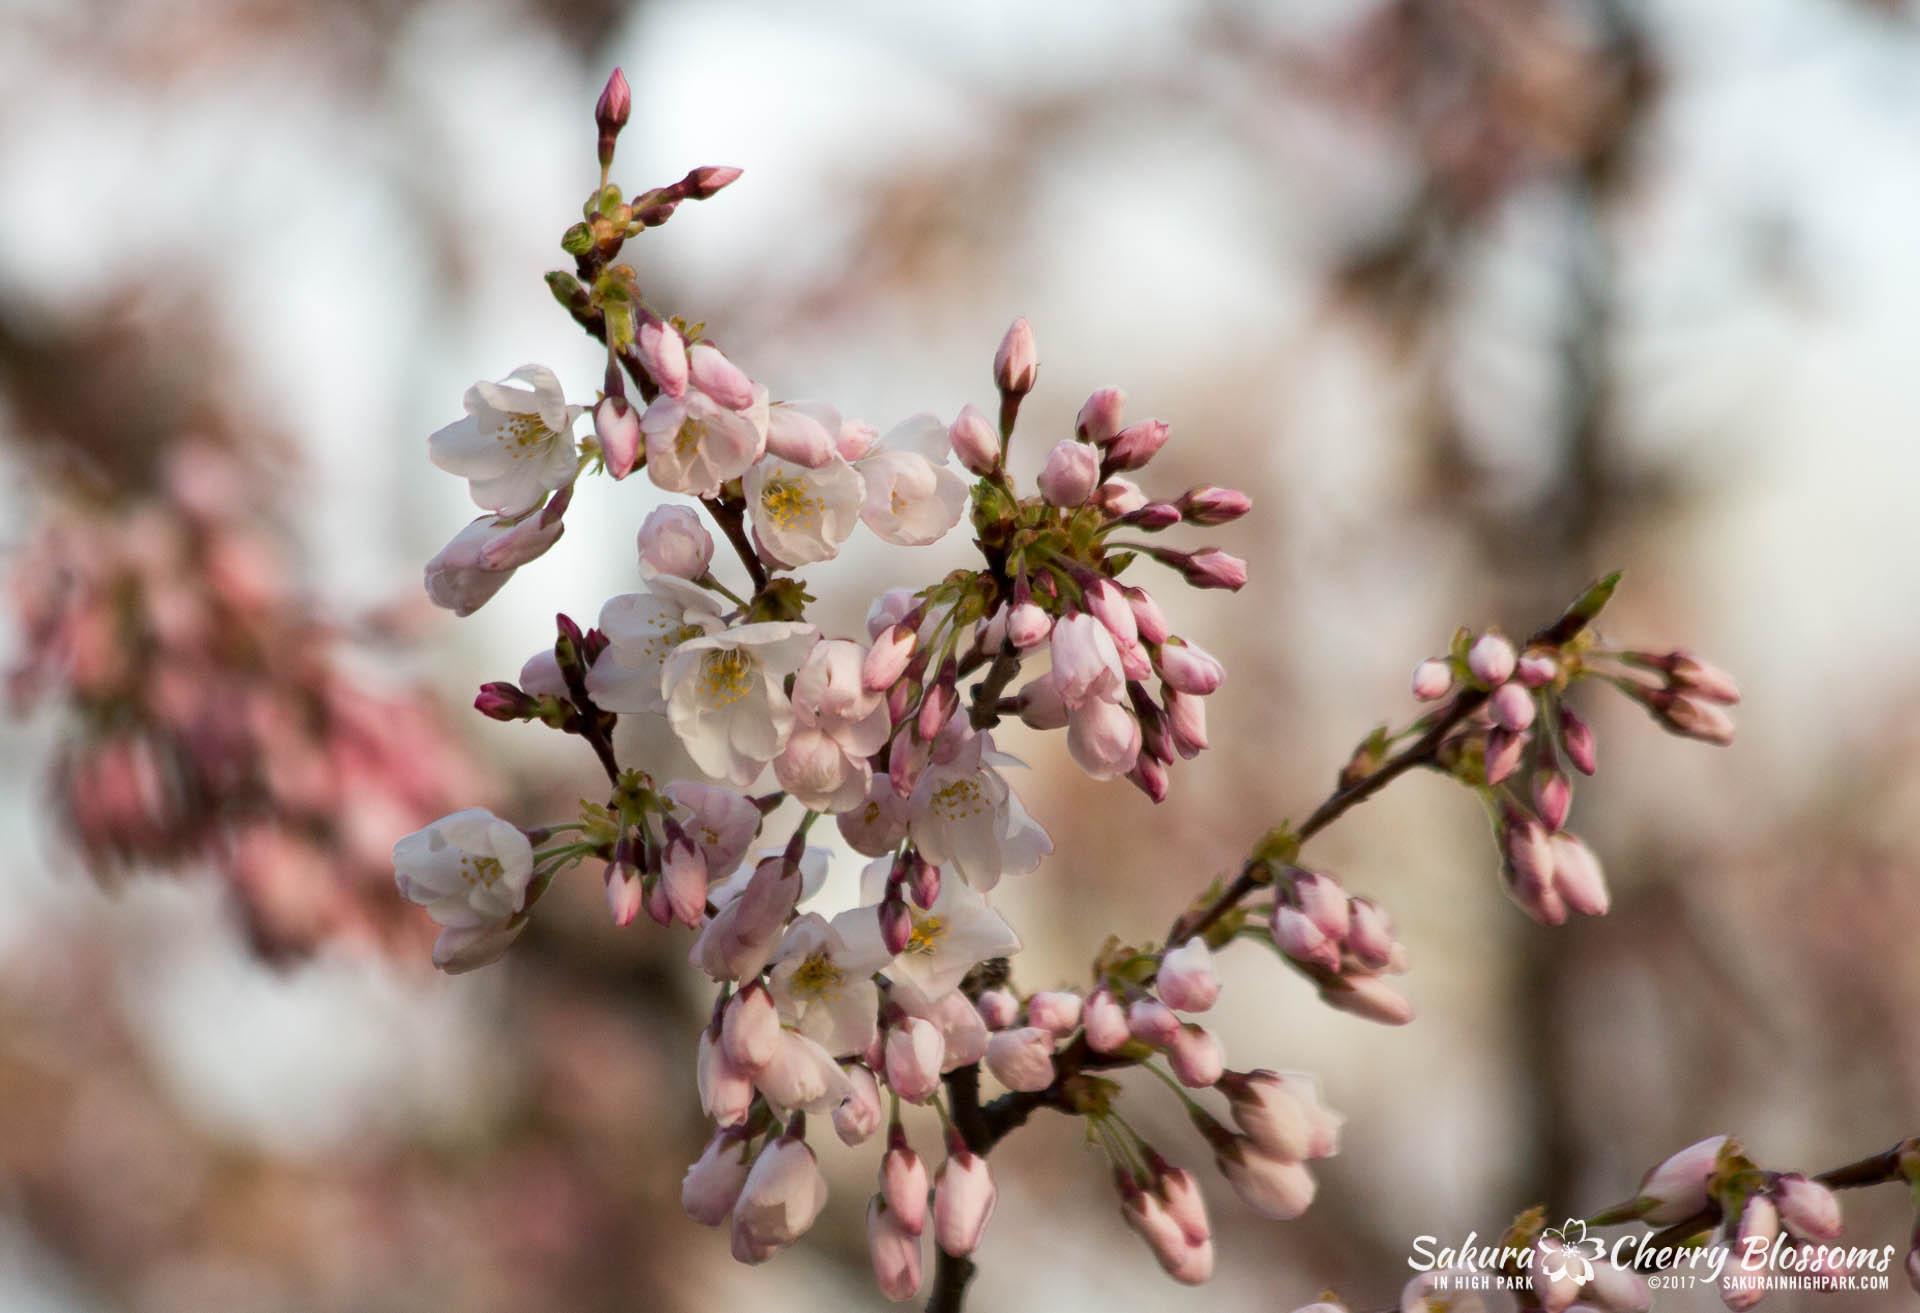 Sakura-Watch-April-24-2017-bloom-has-begun-with-more-to-come-43.jpg